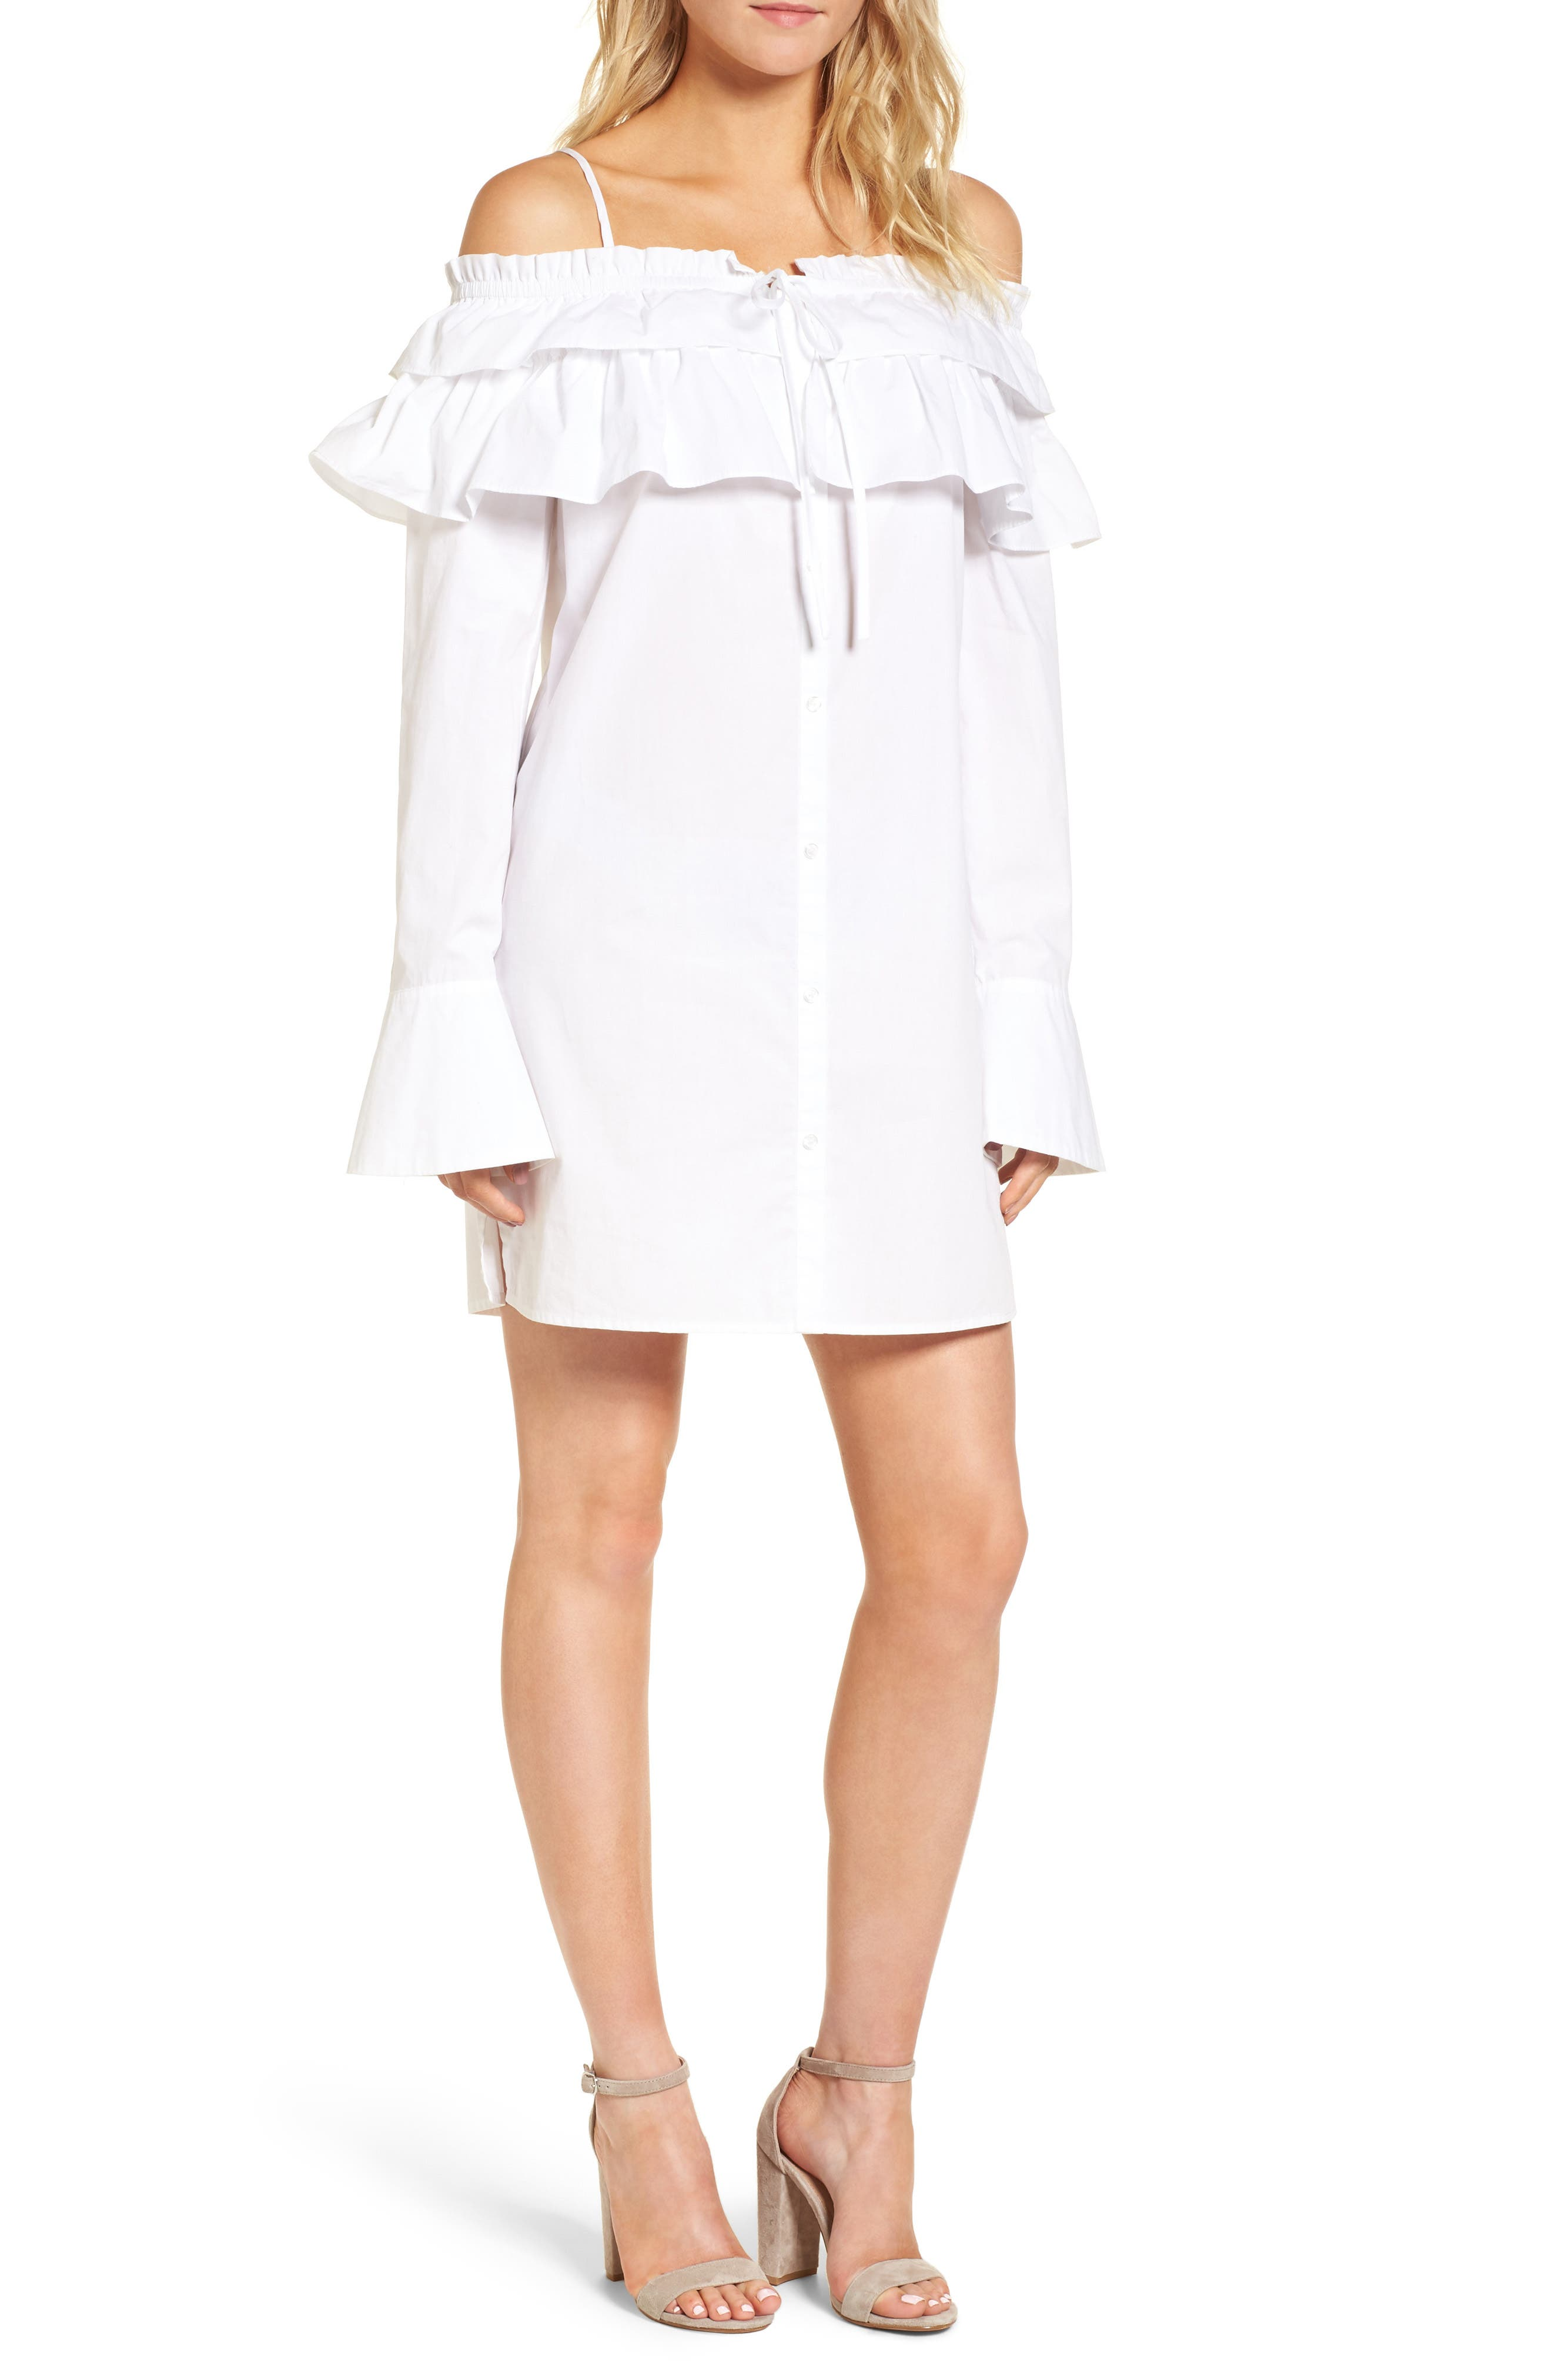 Pallas Off the Shoulder Dress,                         Main,                         color, White